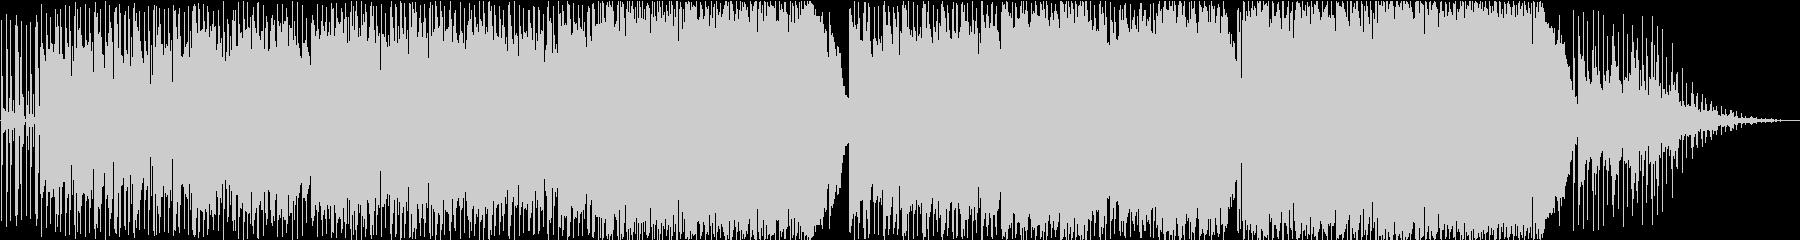 LEMON SOUNDSの未再生の波形